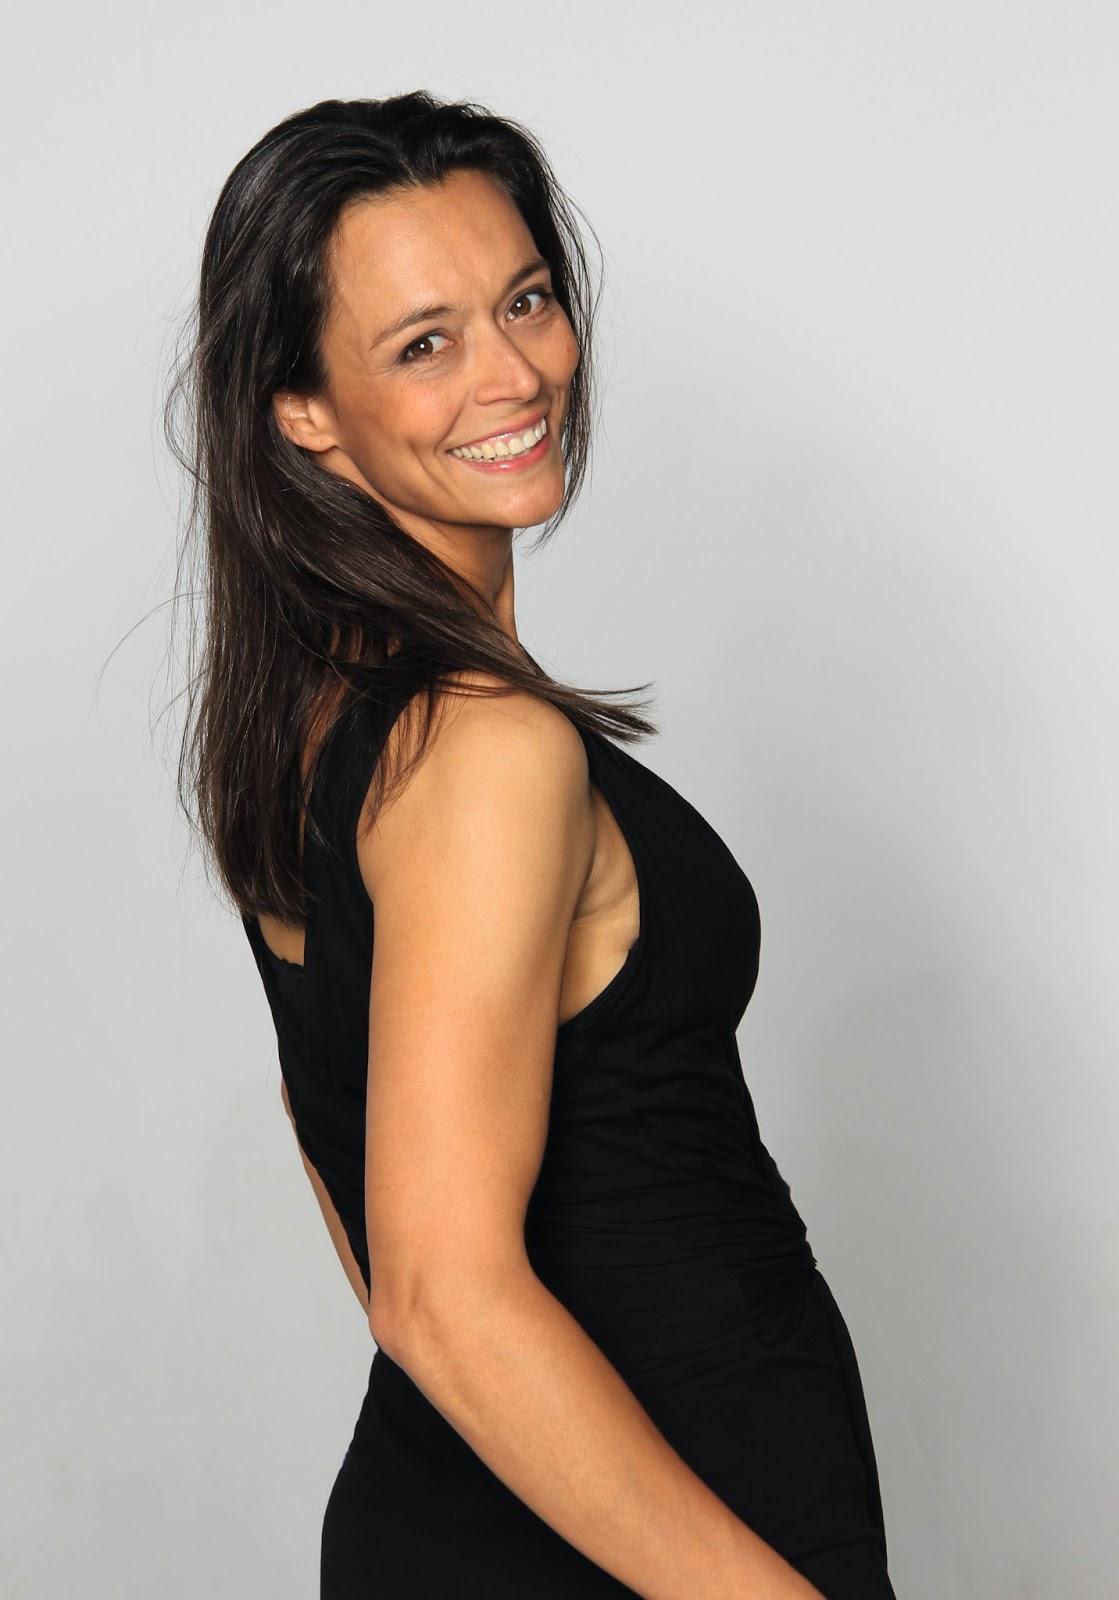 Yvonne De Bark